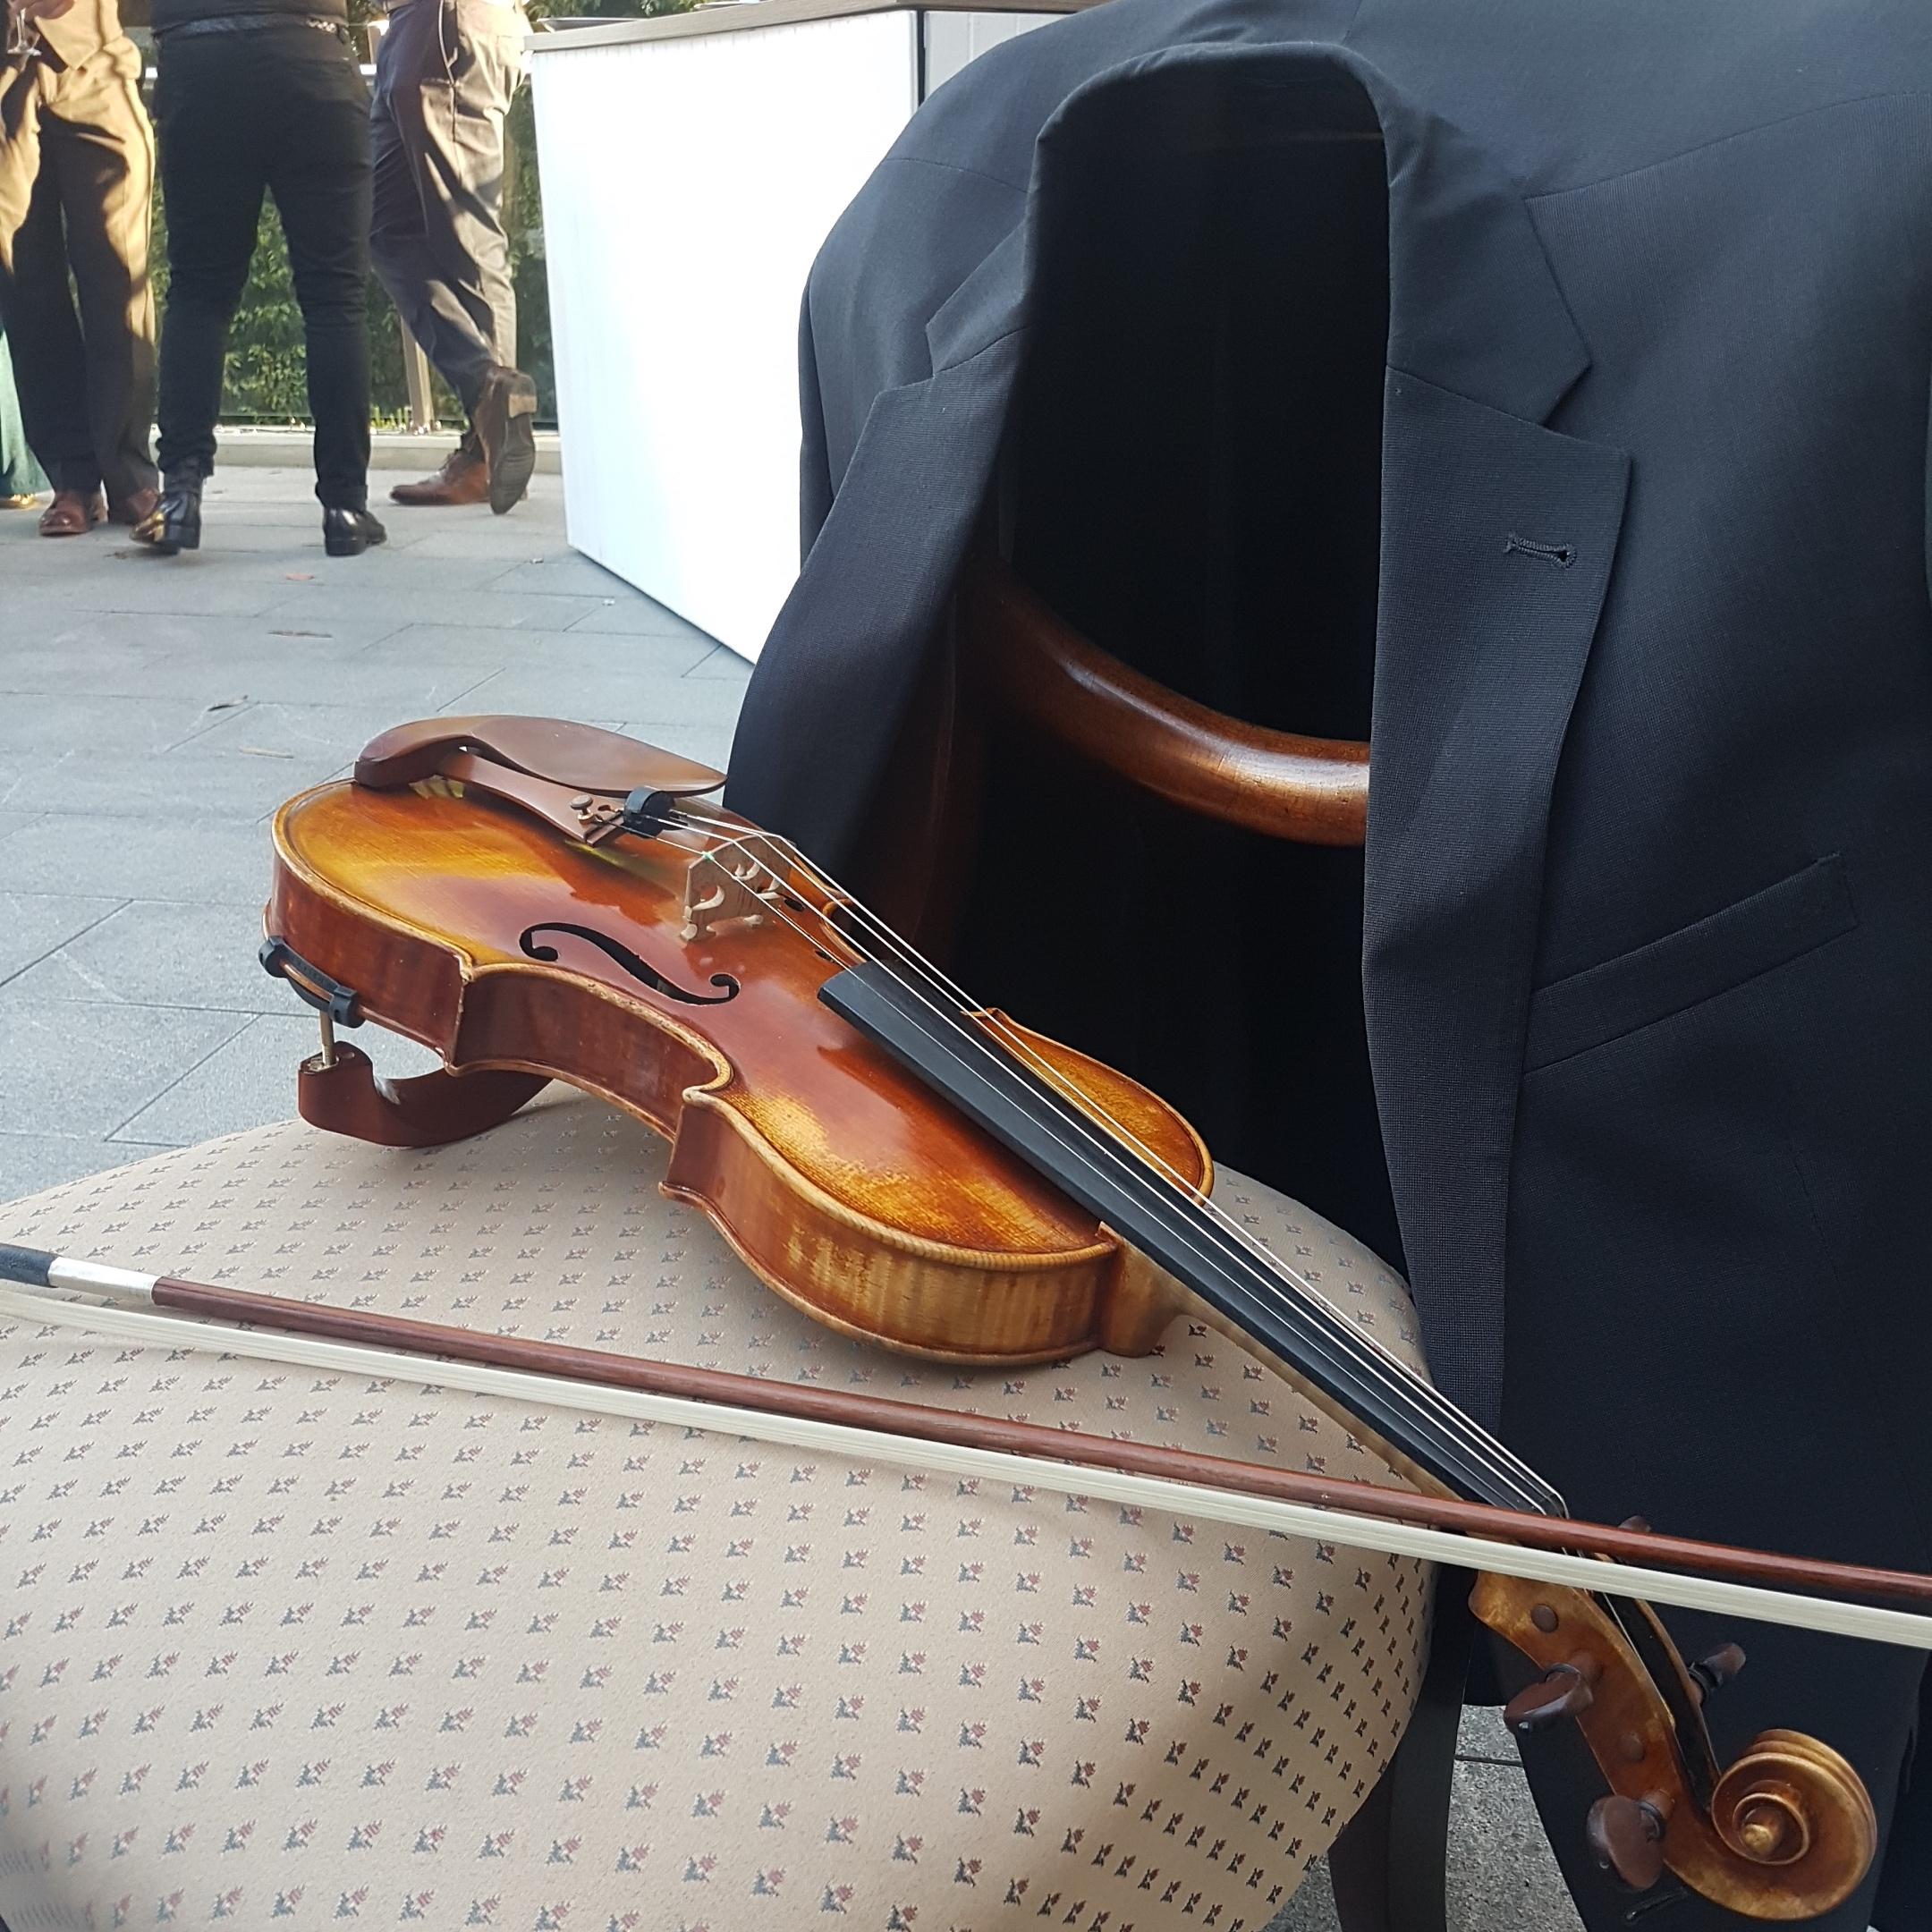 perth-function-string-music-hire-wedding-riverside-musiciansperth-function-string-music-hire-wedding-riverside-musicians-classical-contemporary-violin